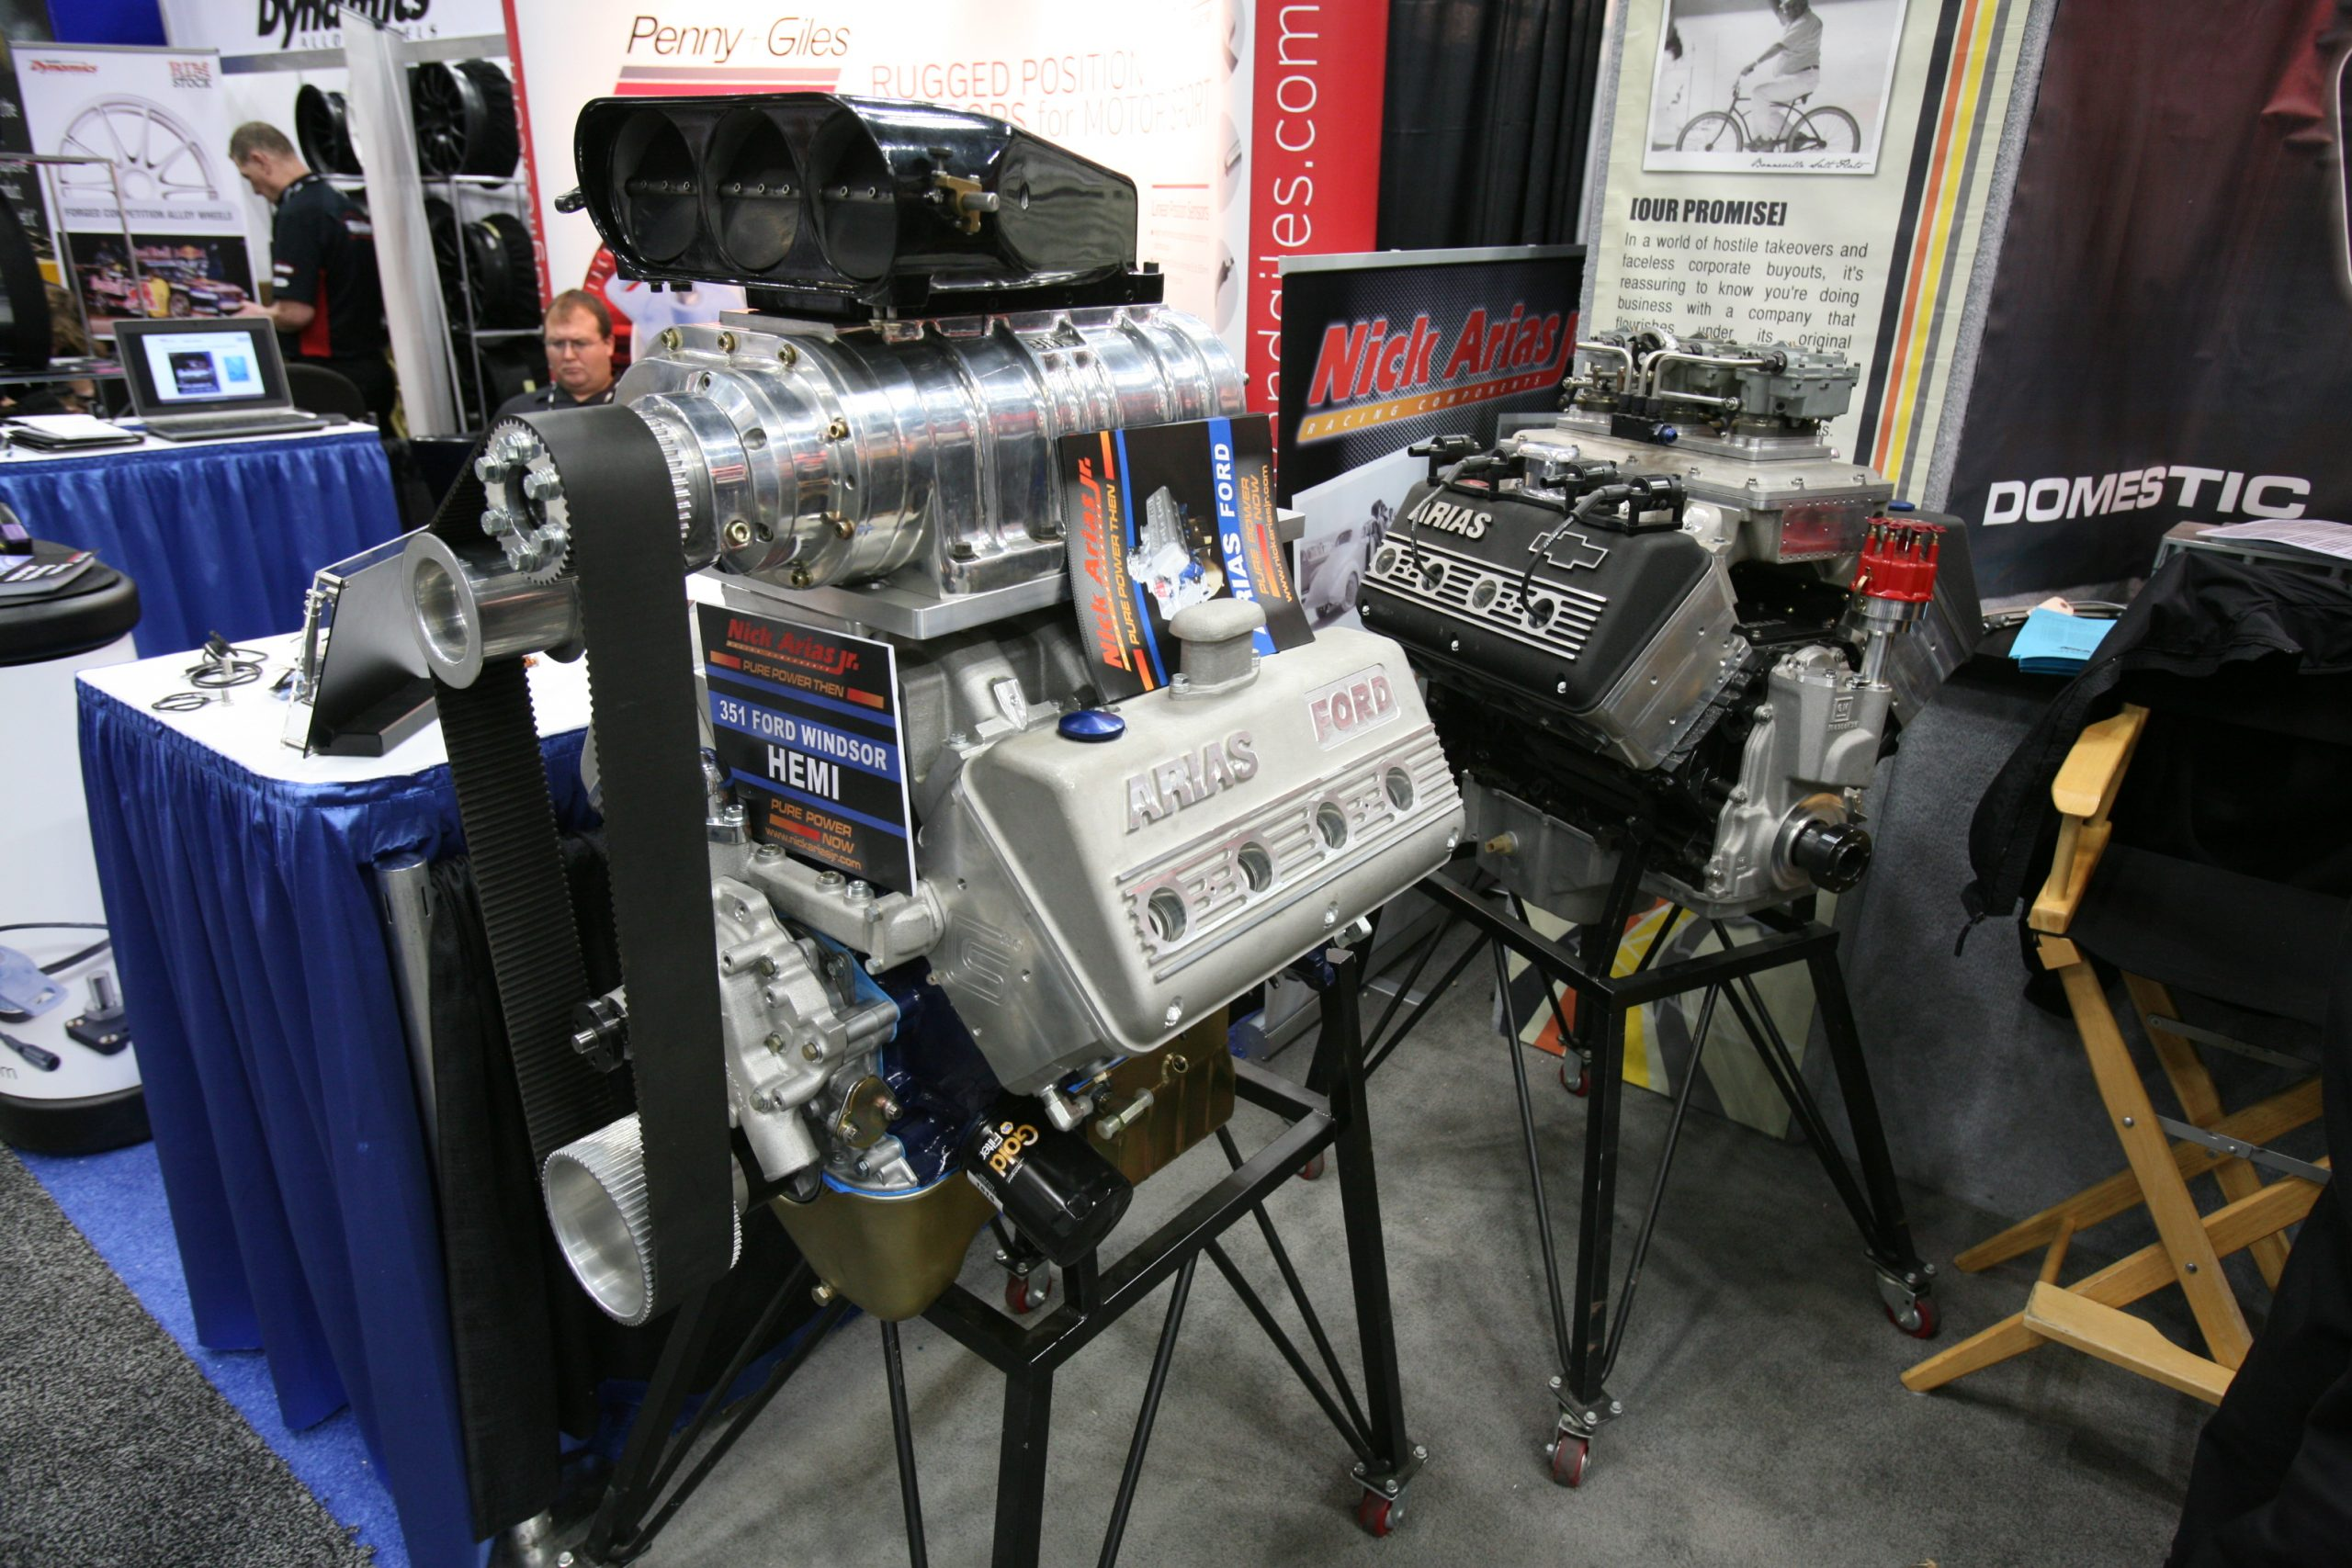 Ford Arias hemi valve cover